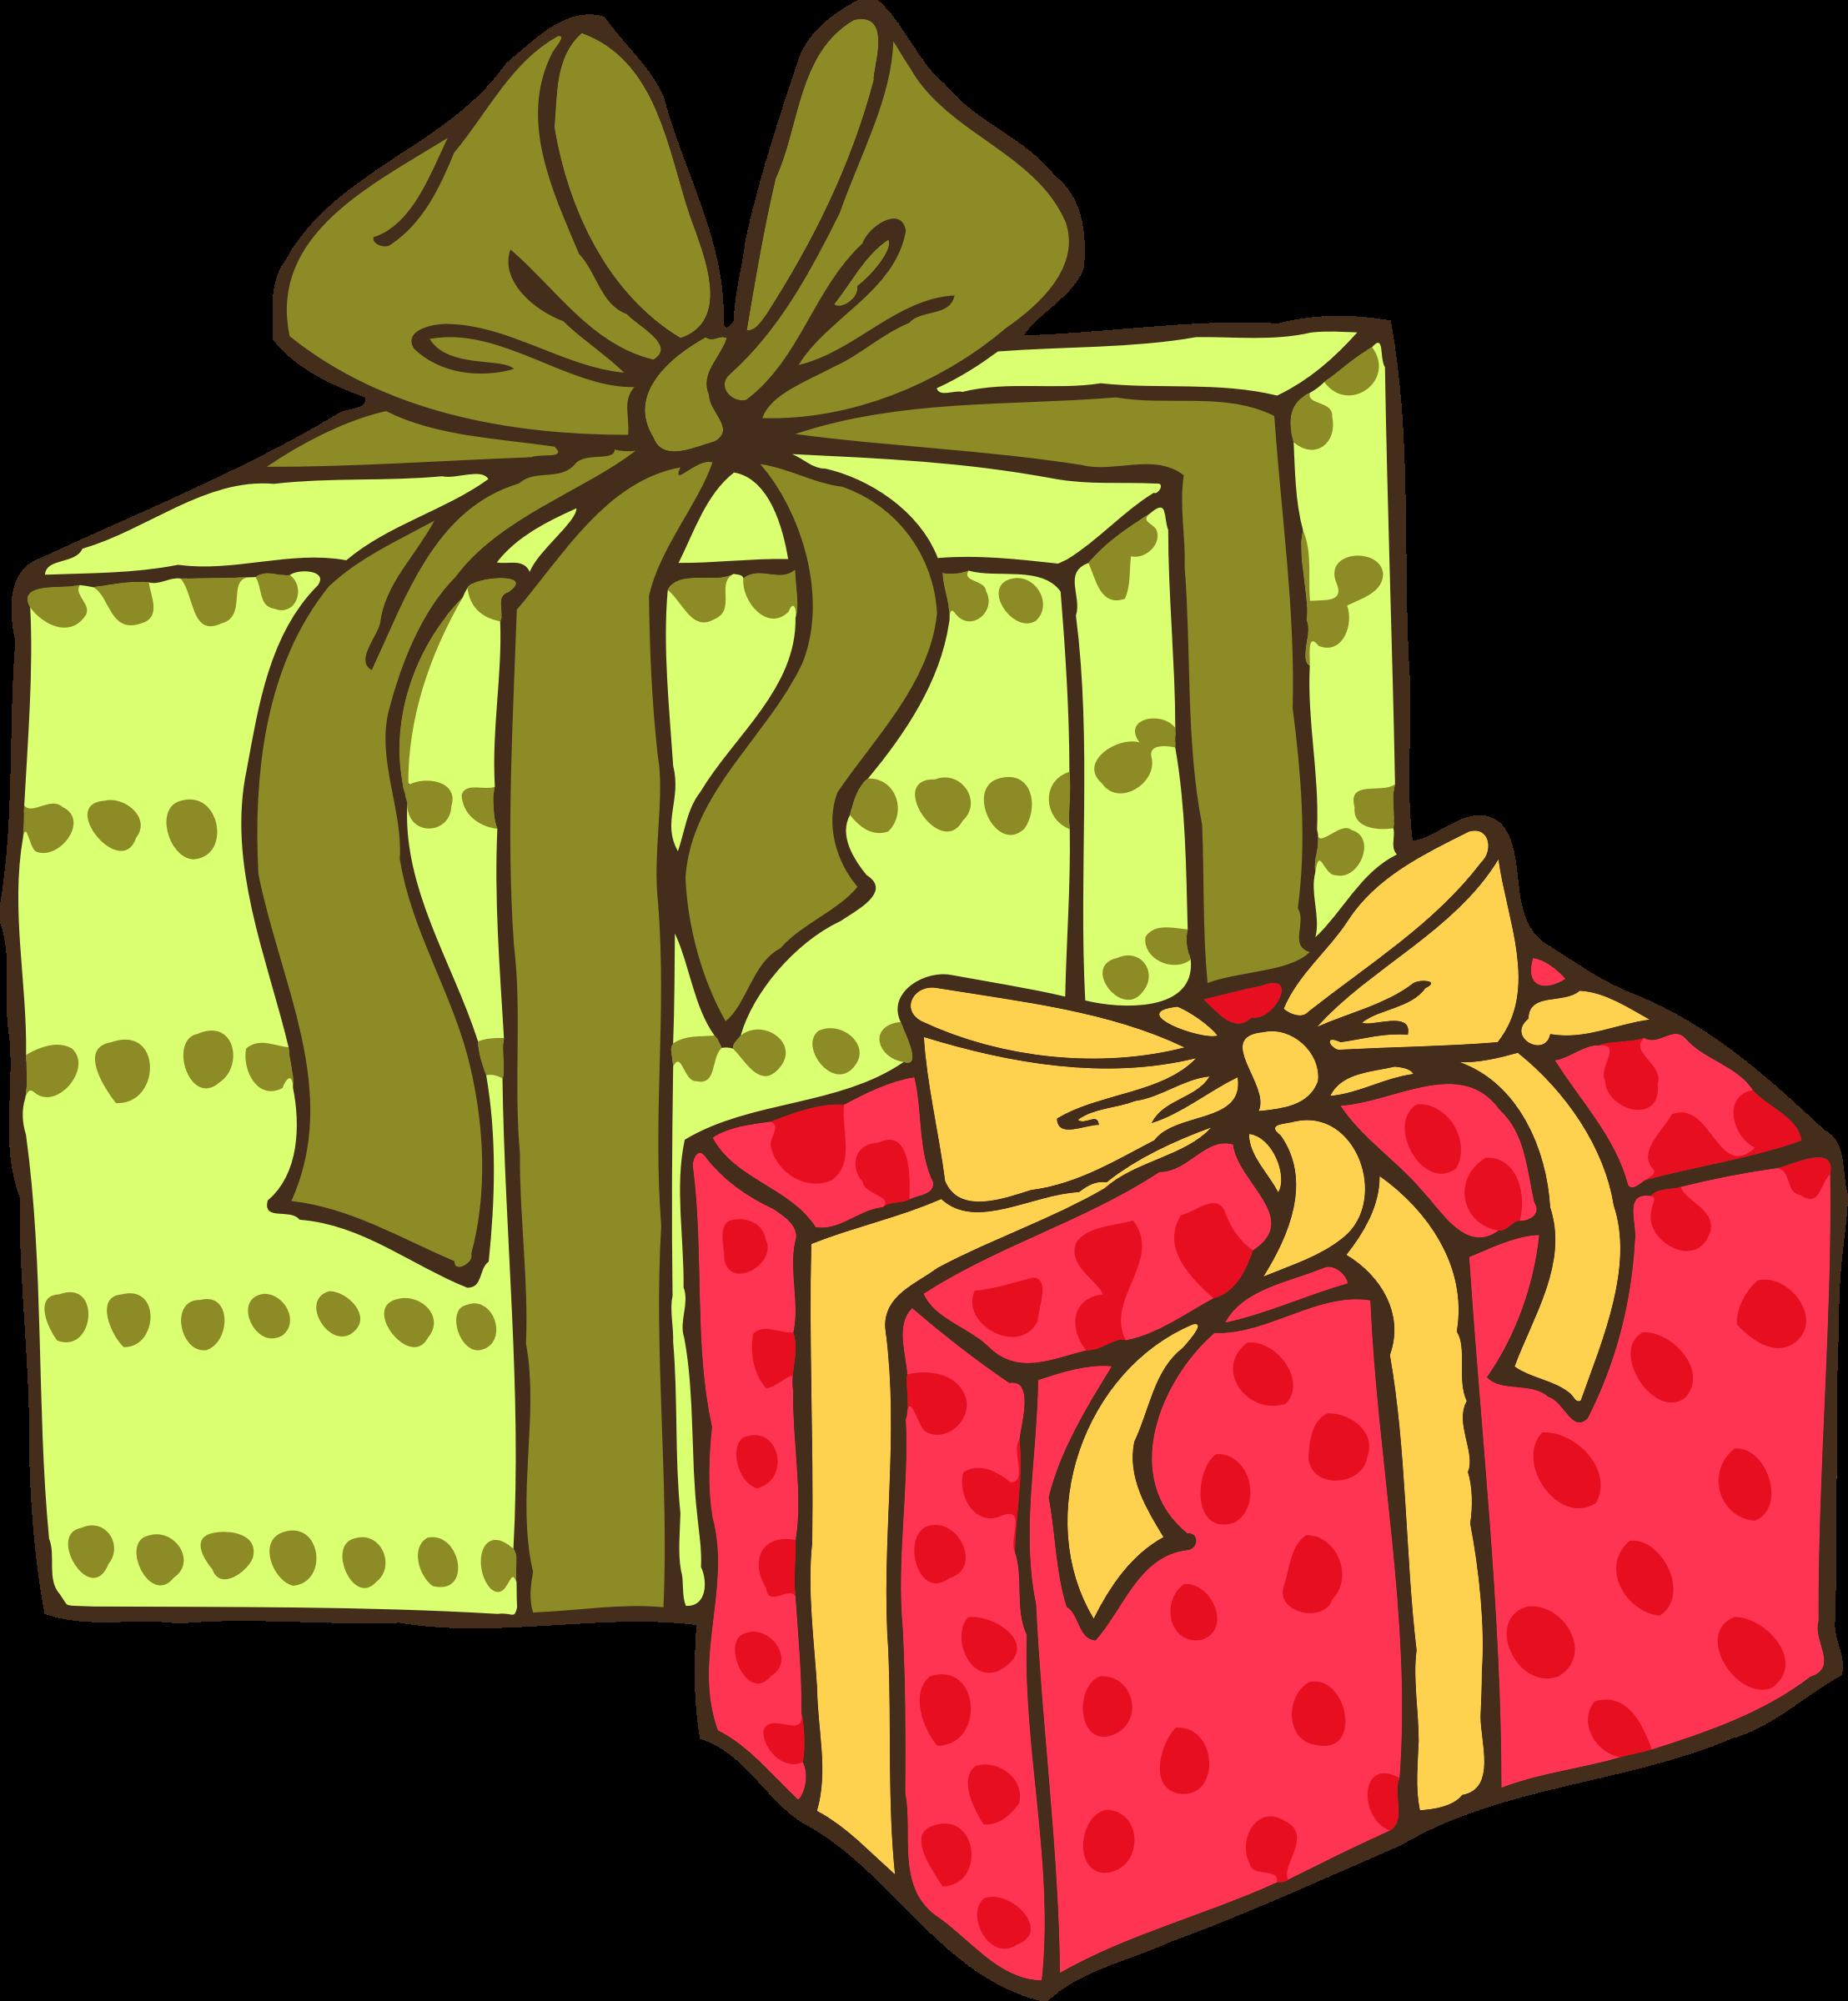 f1079e54d18f46391048_gifts.jpg